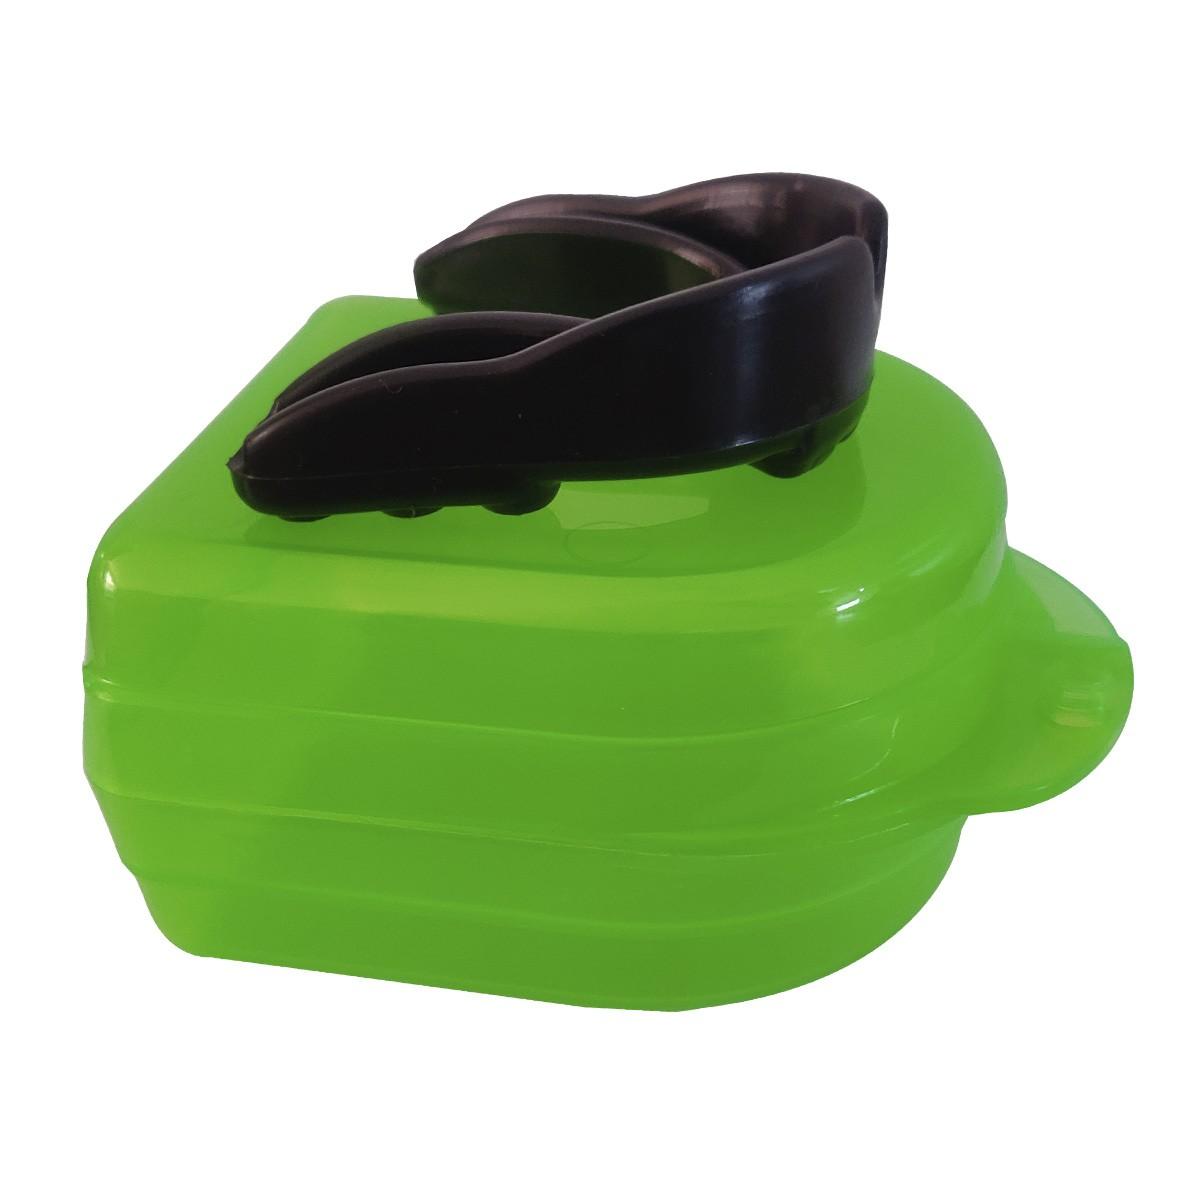 Protetor Bucal Simples C/ Estojo - Pulser  - PRALUTA SHOP